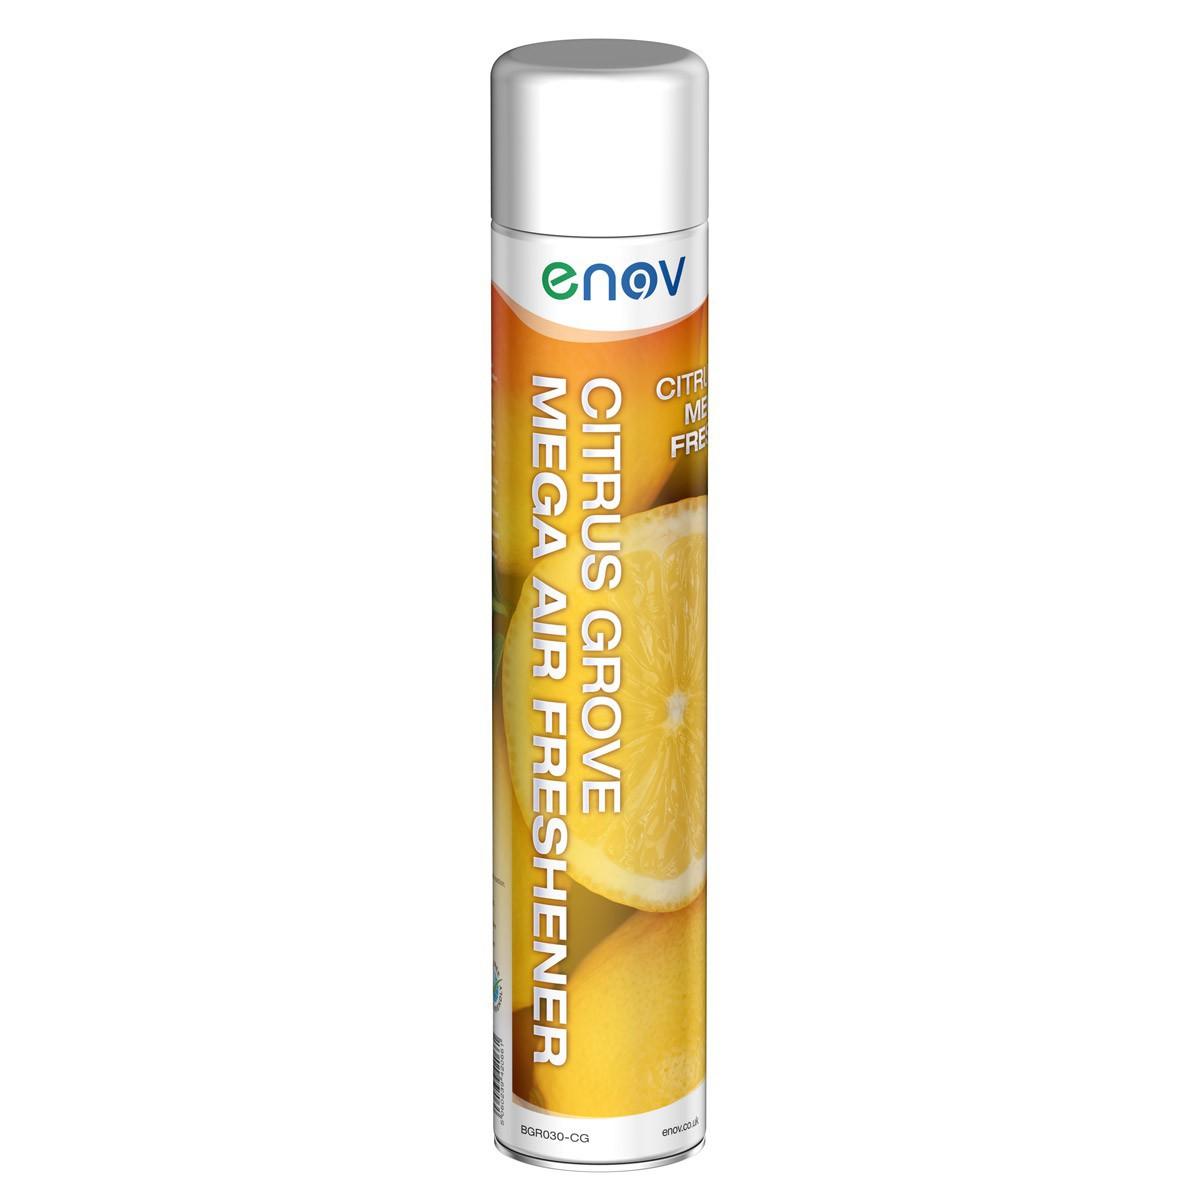 Enov Citrus Grove Mega Air Freshener